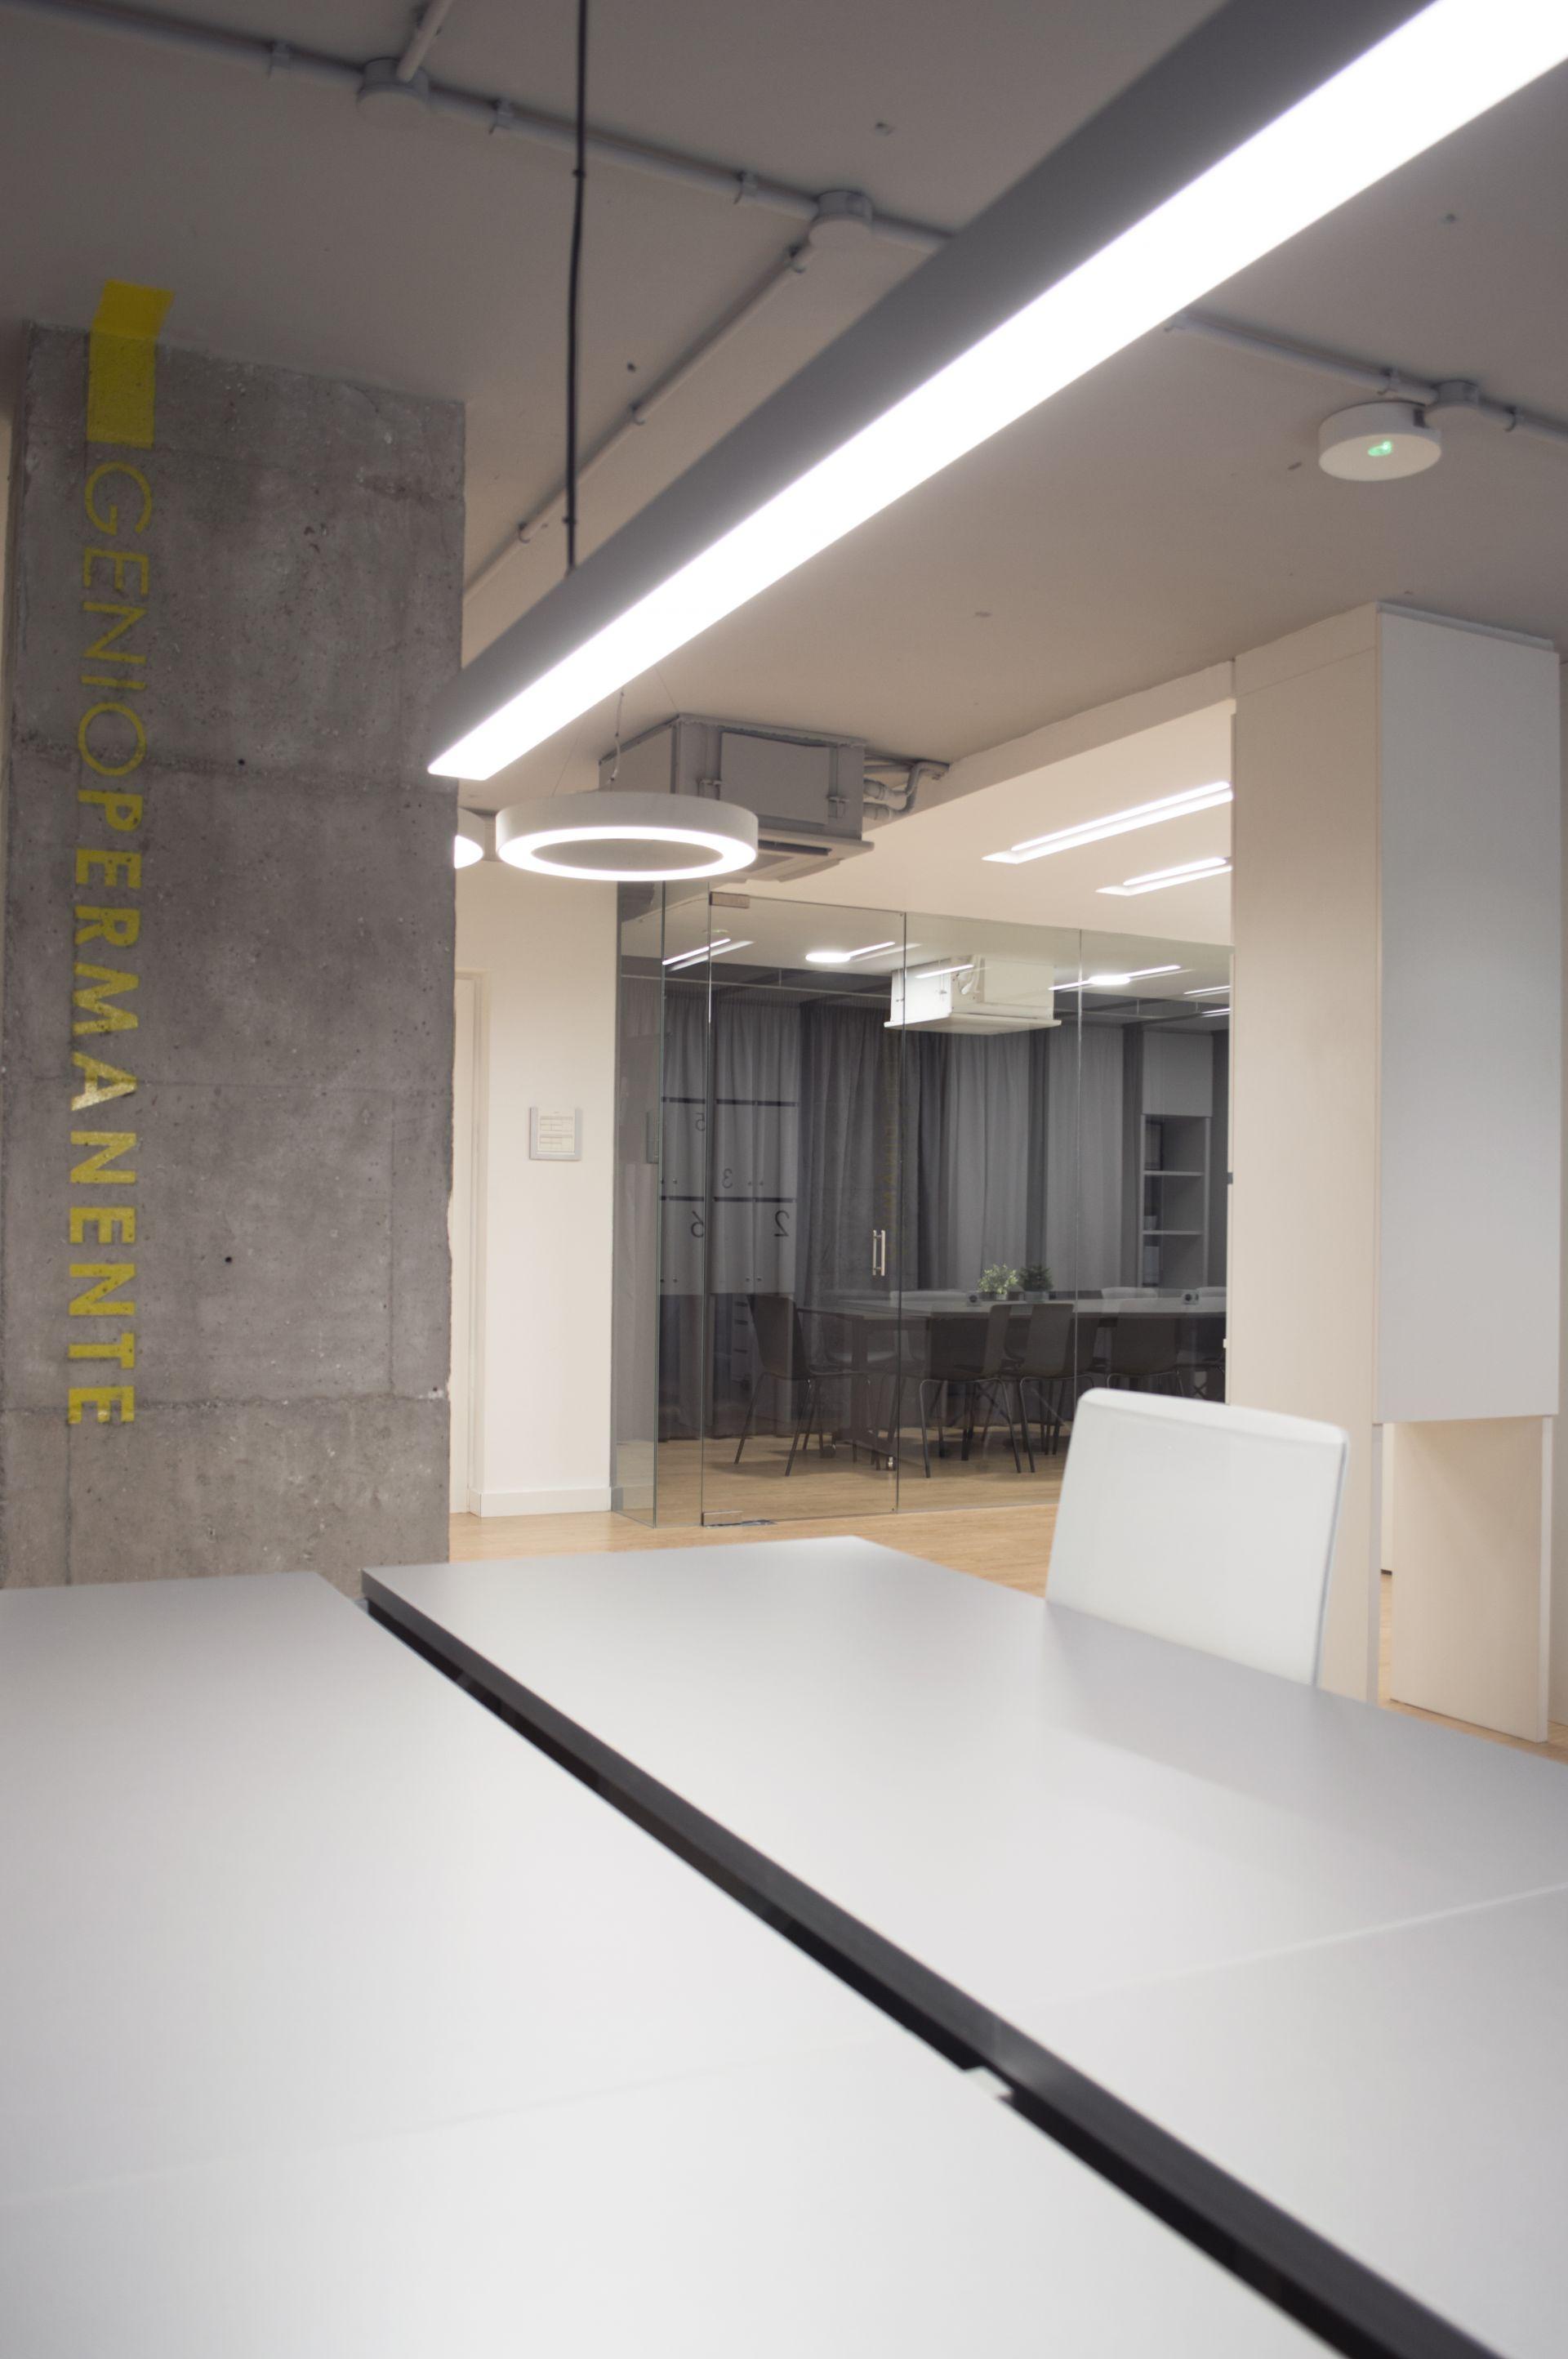 Ingenio Coworking Space, Tenerife